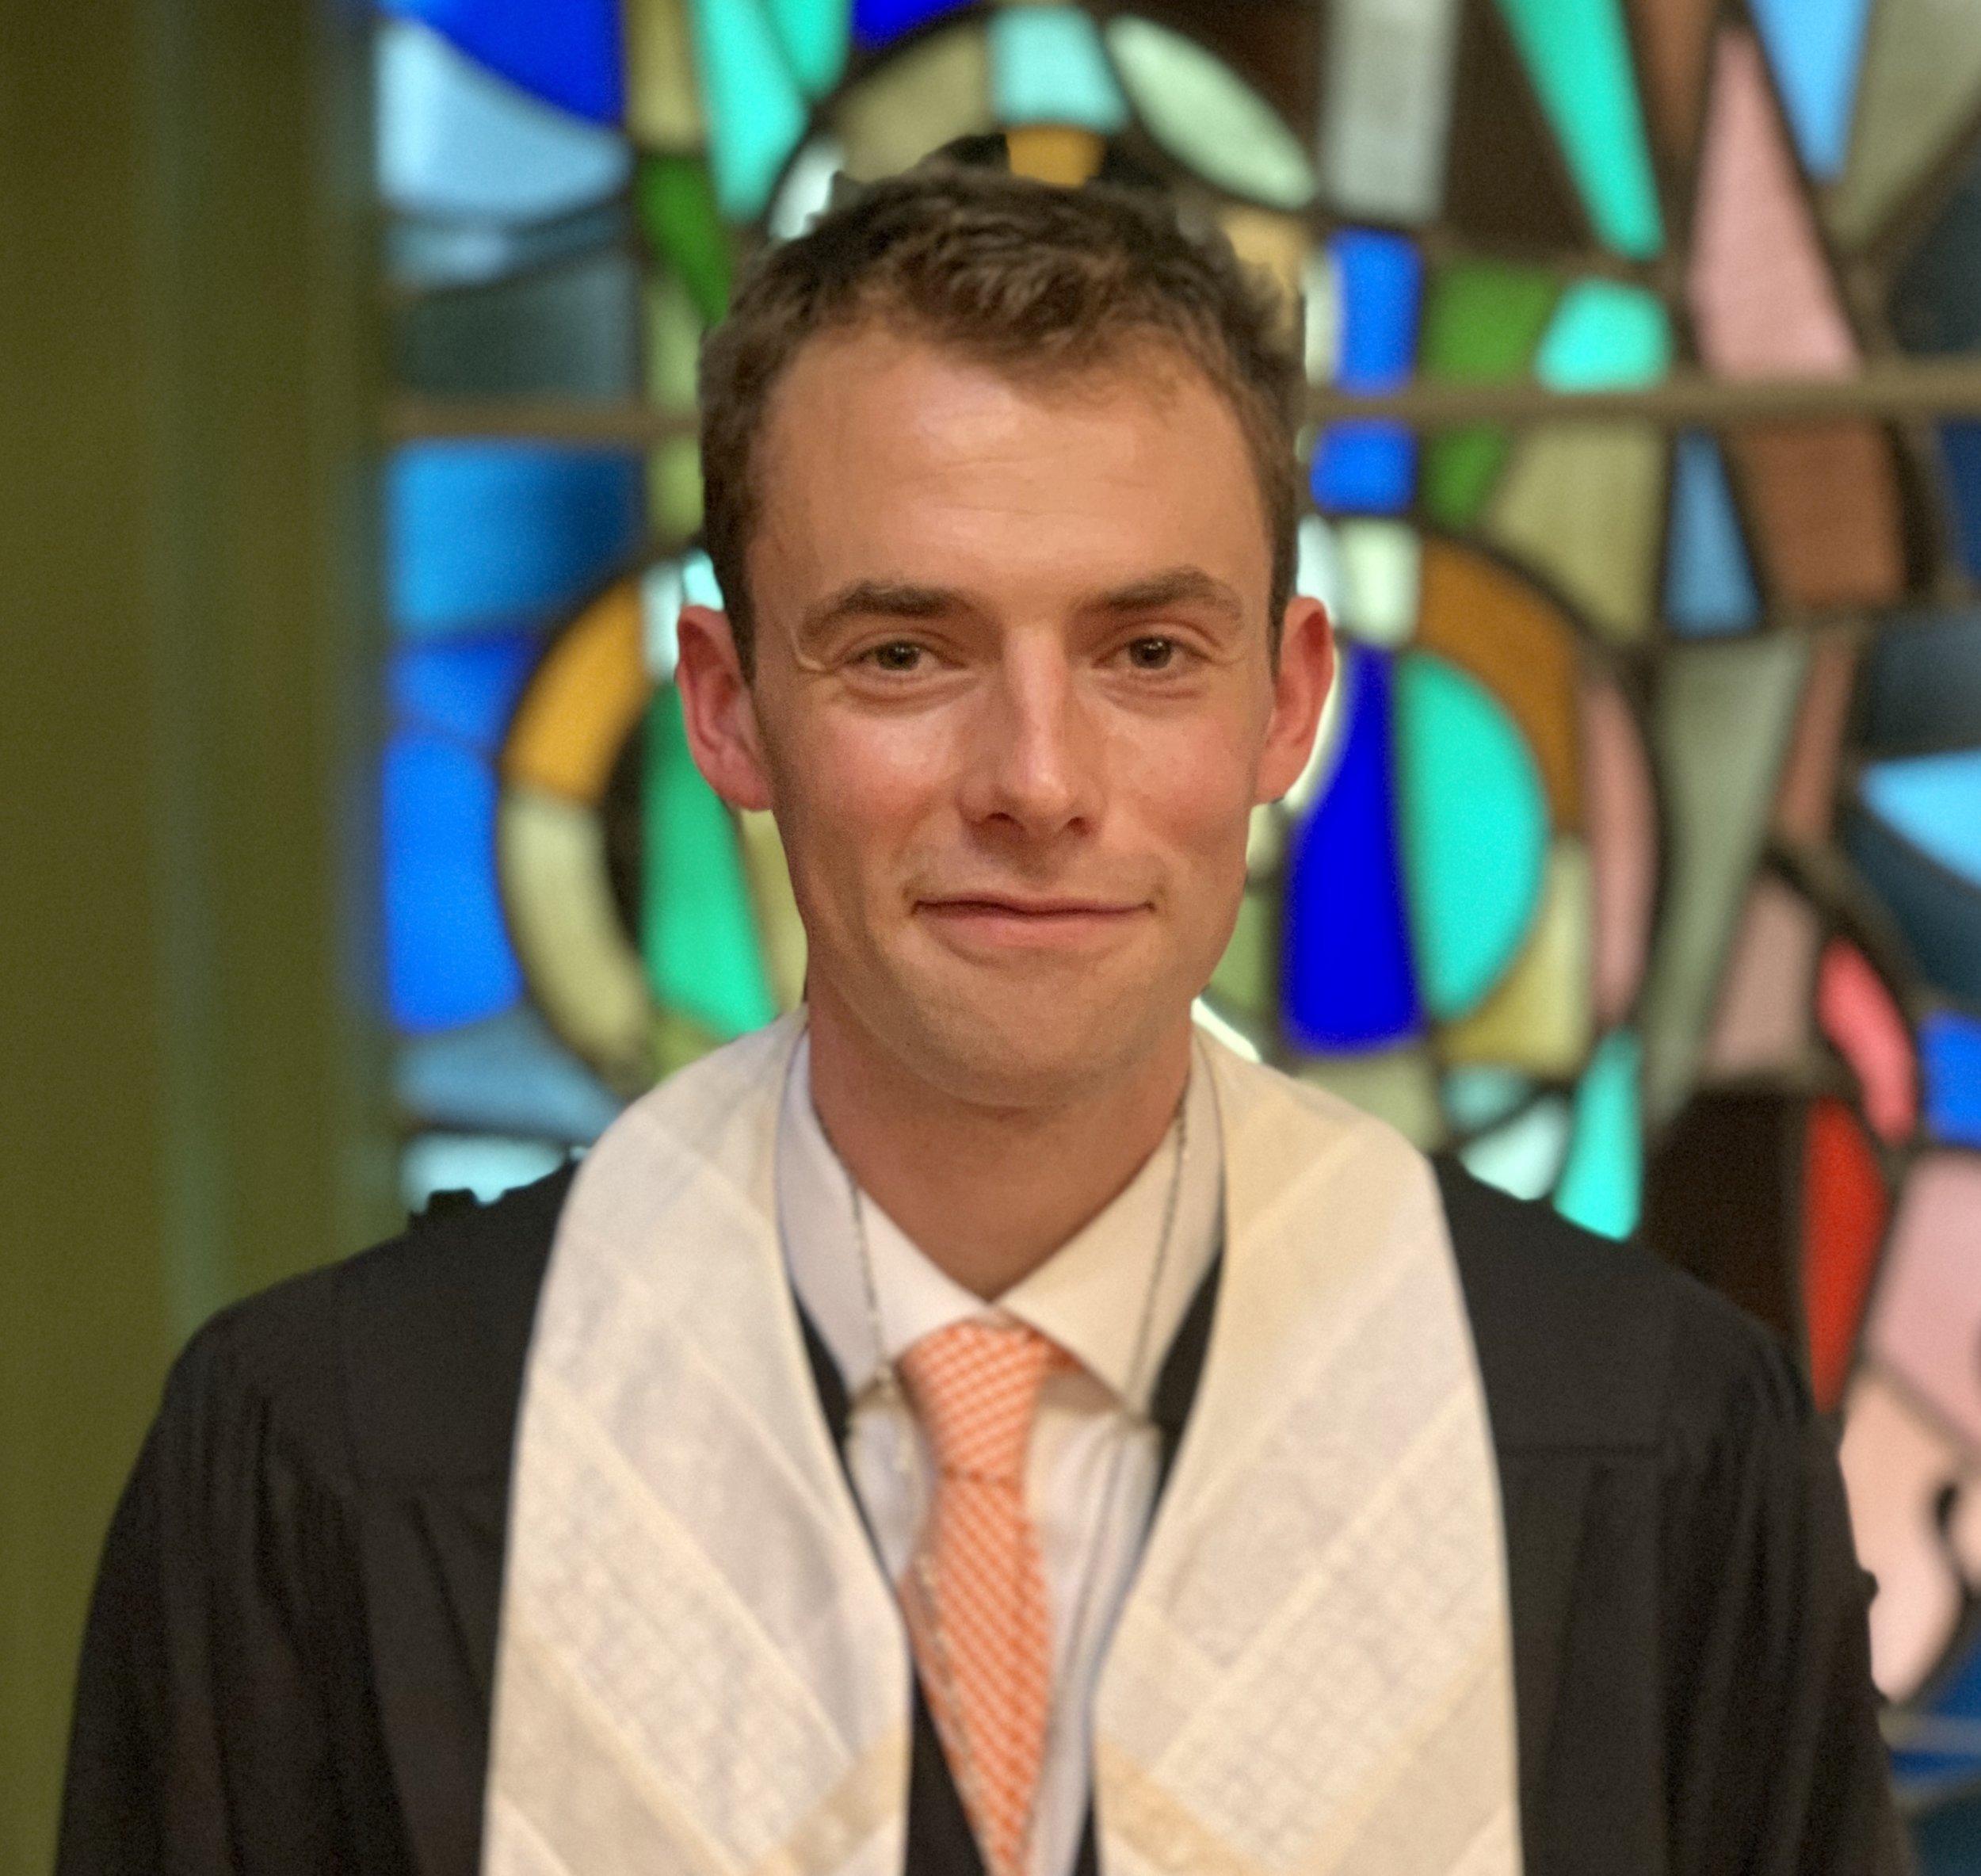 Nate Klug - Pastor, Arlington Community Church